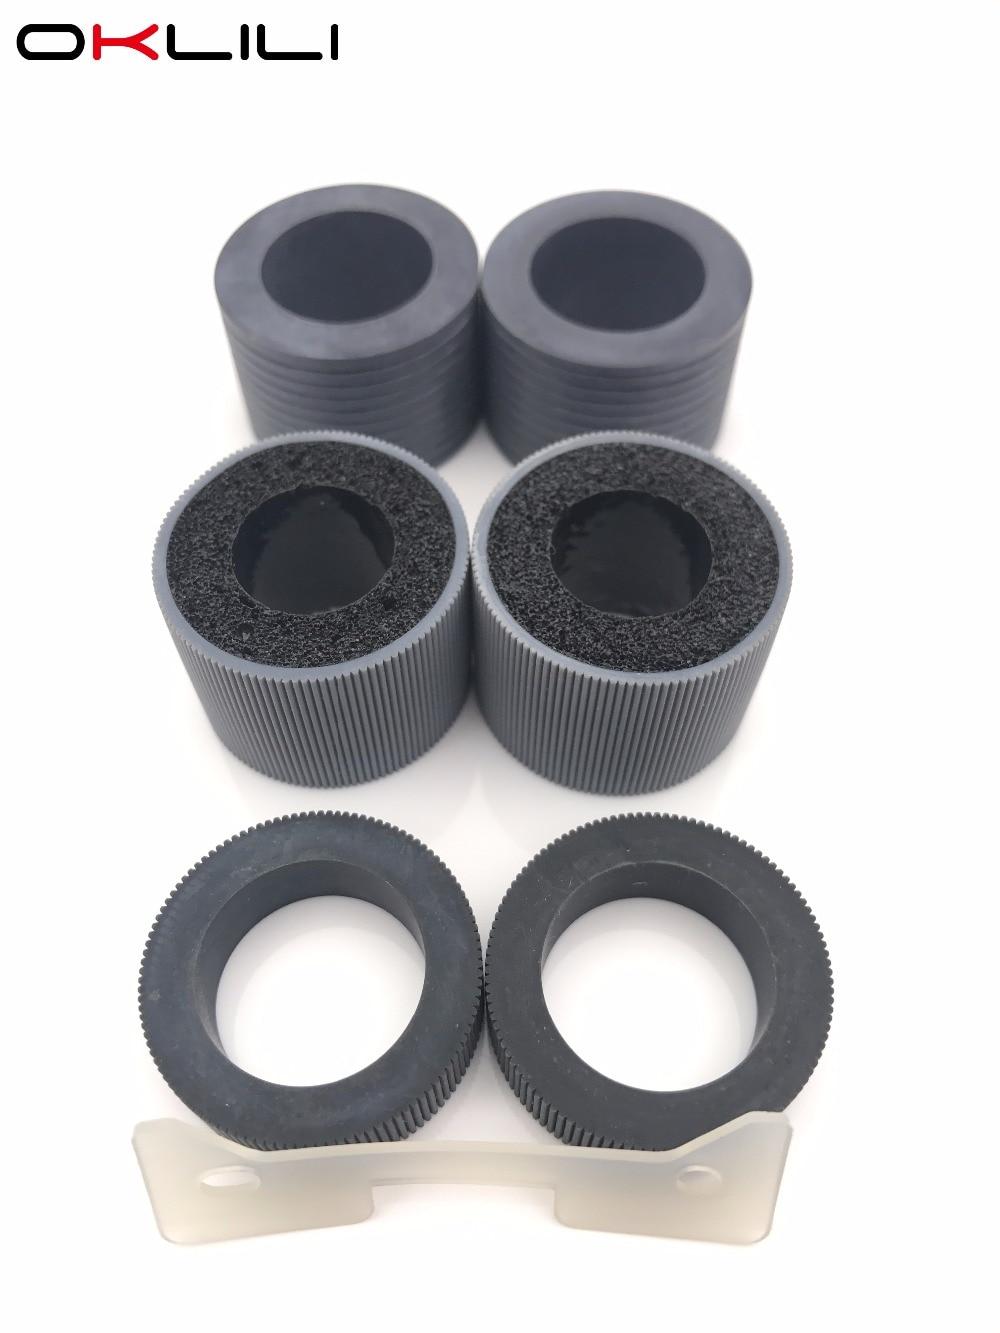 PA03450-K011 PA03450-K012 PA03450-K013 Pad Assy Pick Roller Brake Roller Separator Roller for Fujitsu fi-5950 fi-5900C fi-5900